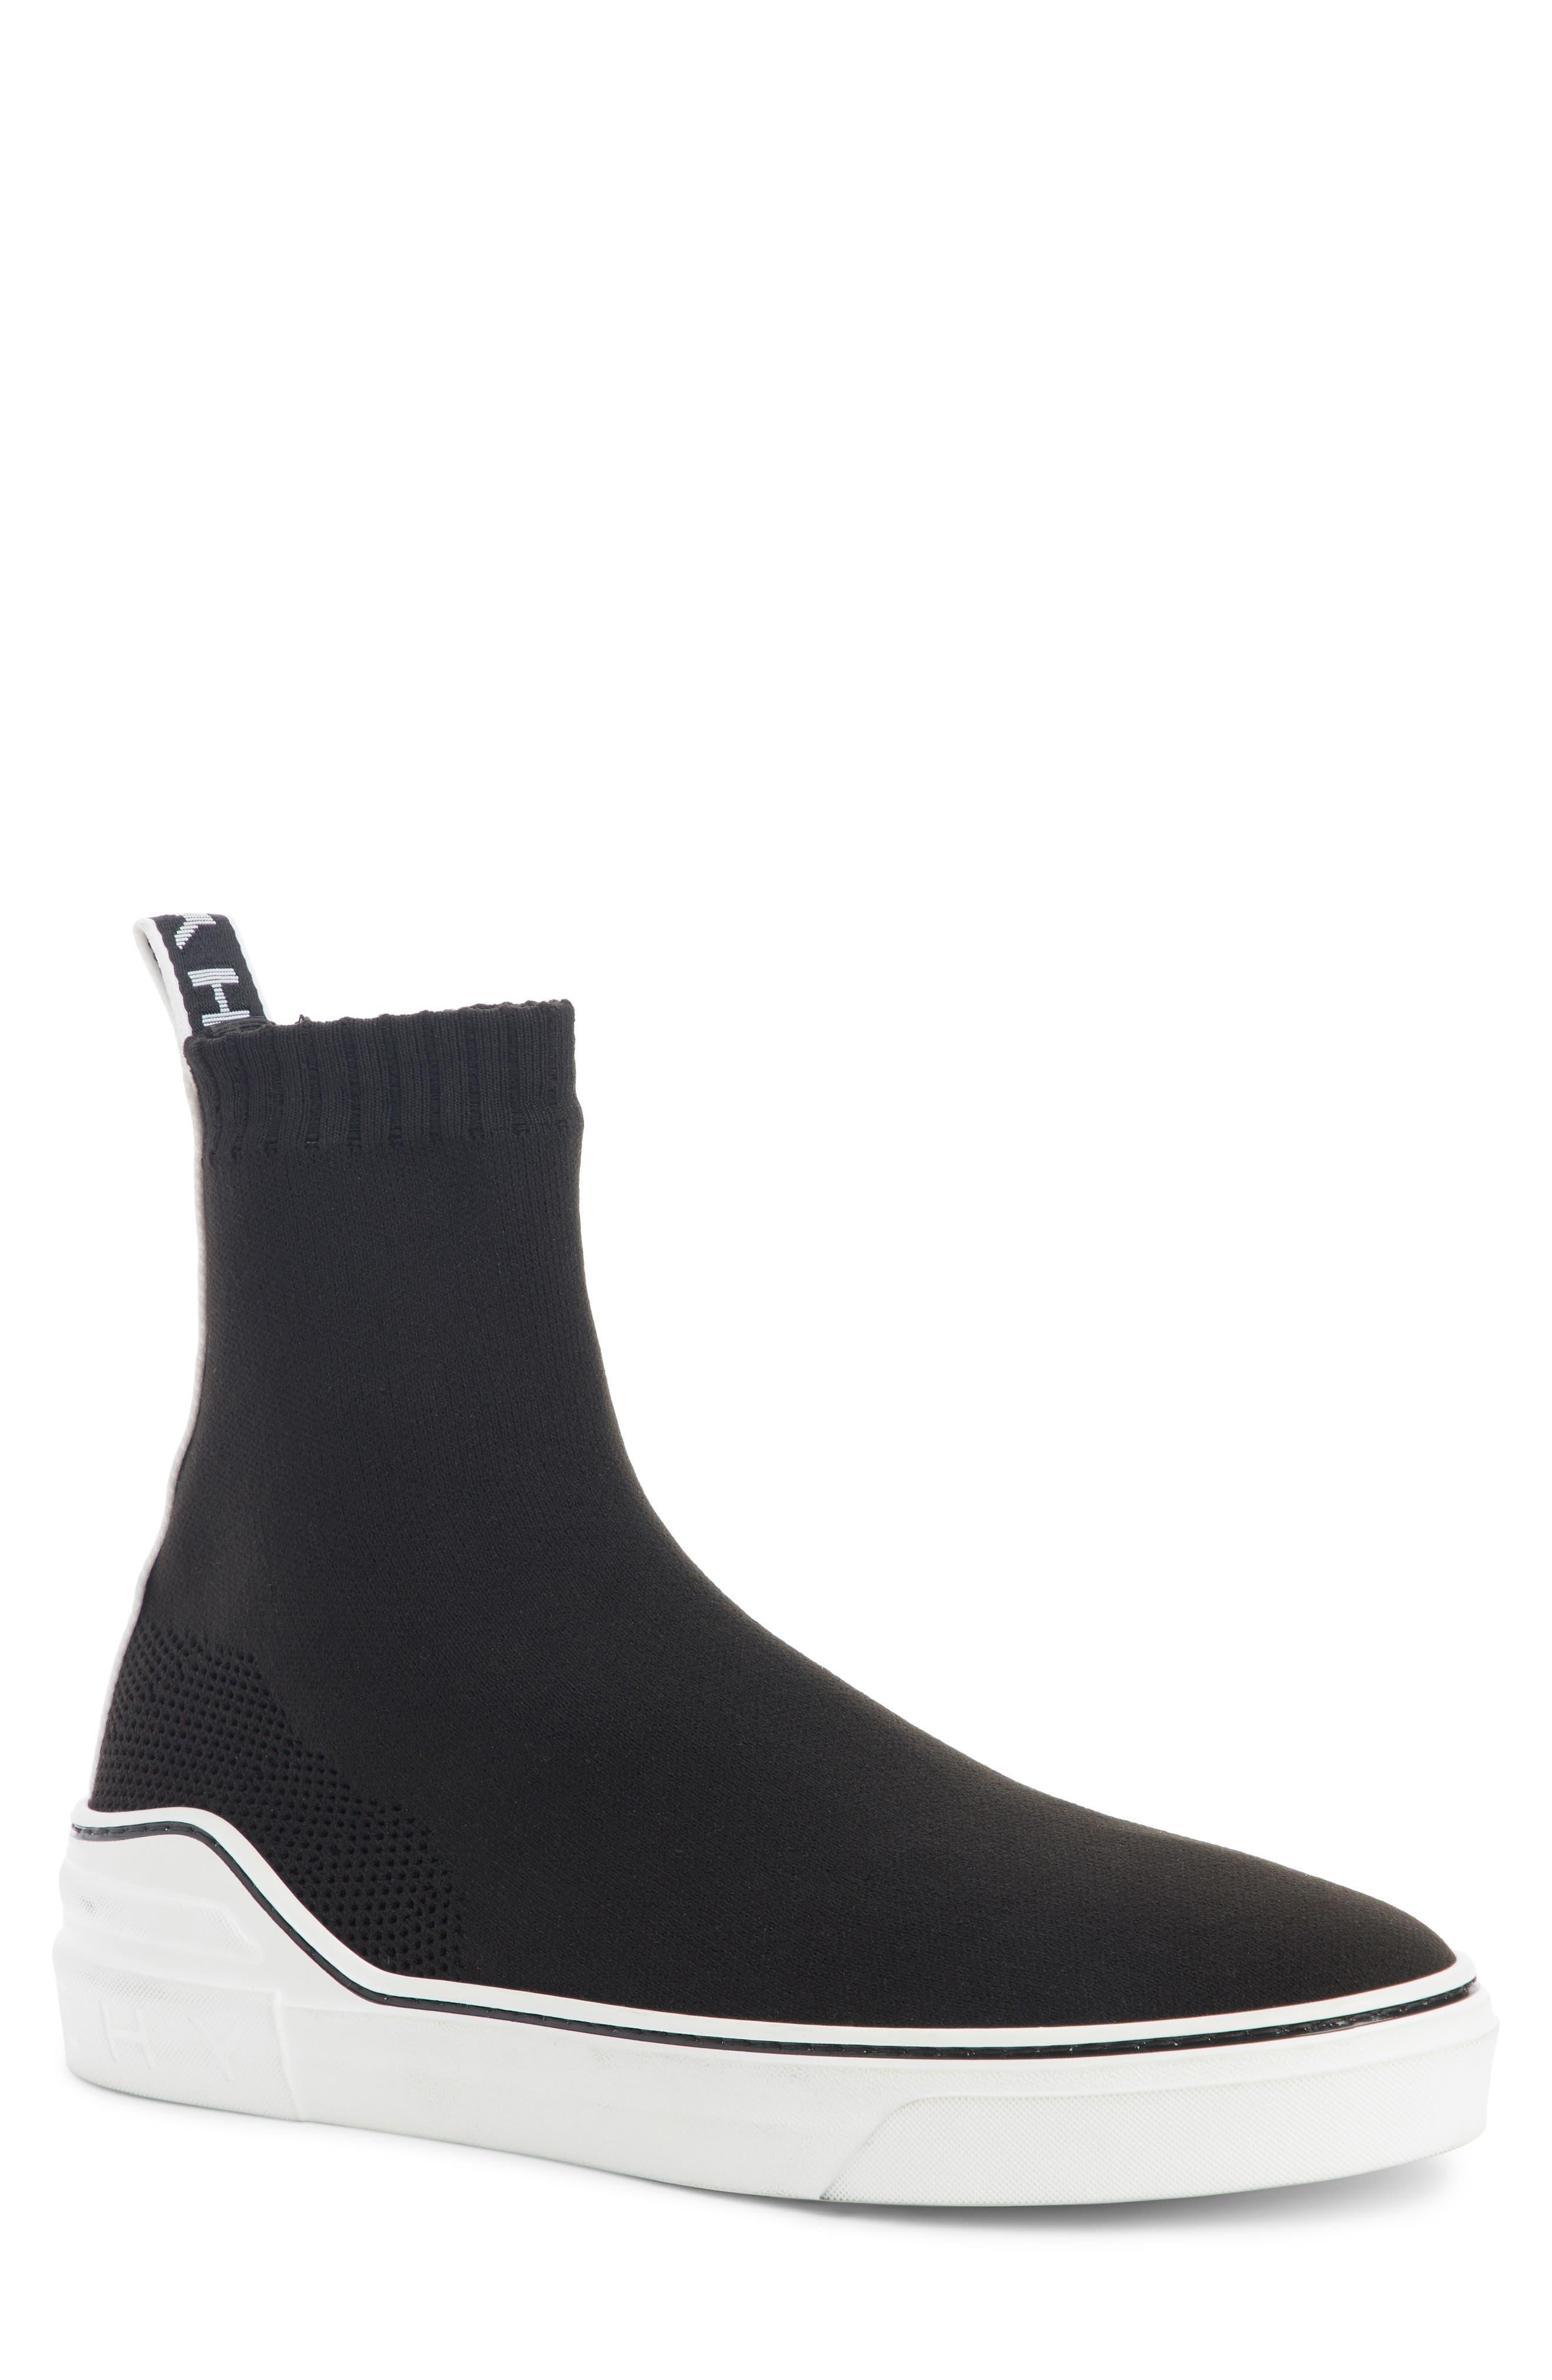 George V Hi Sock Sneaker,                             Main thumbnail 1, color,                             001